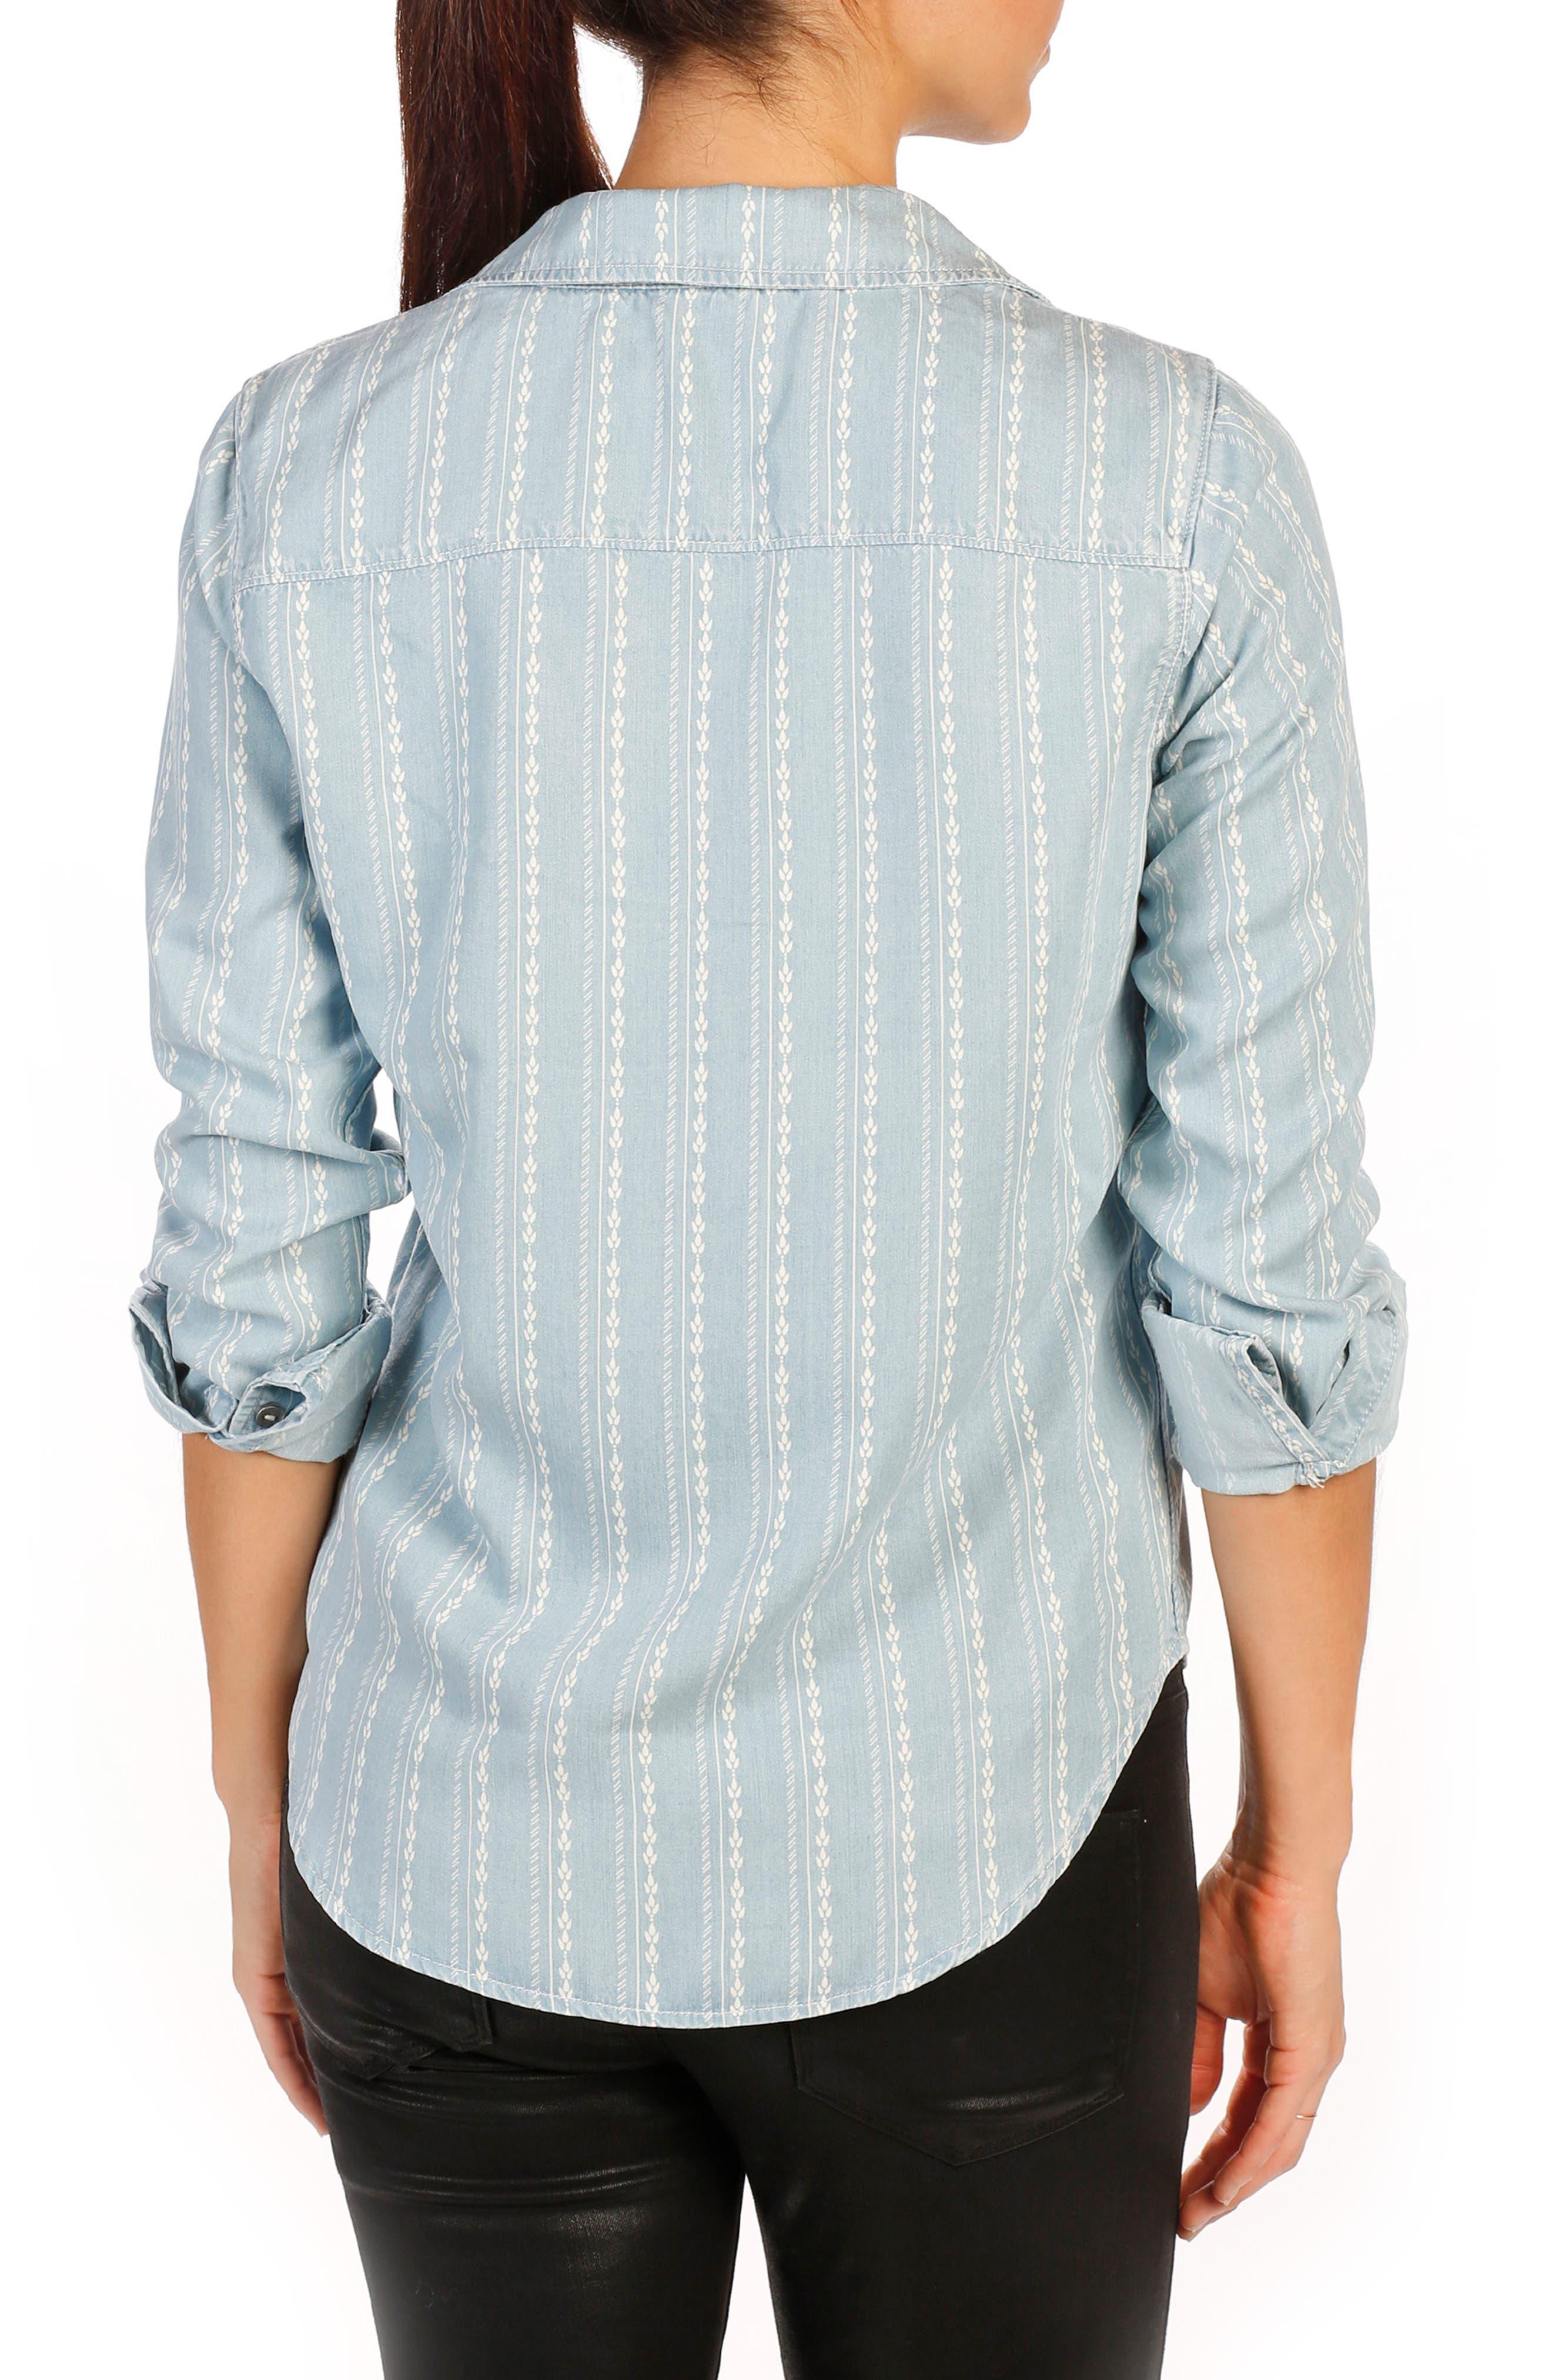 Trista Denim Shirt,                             Alternate thumbnail 2, color,                             400